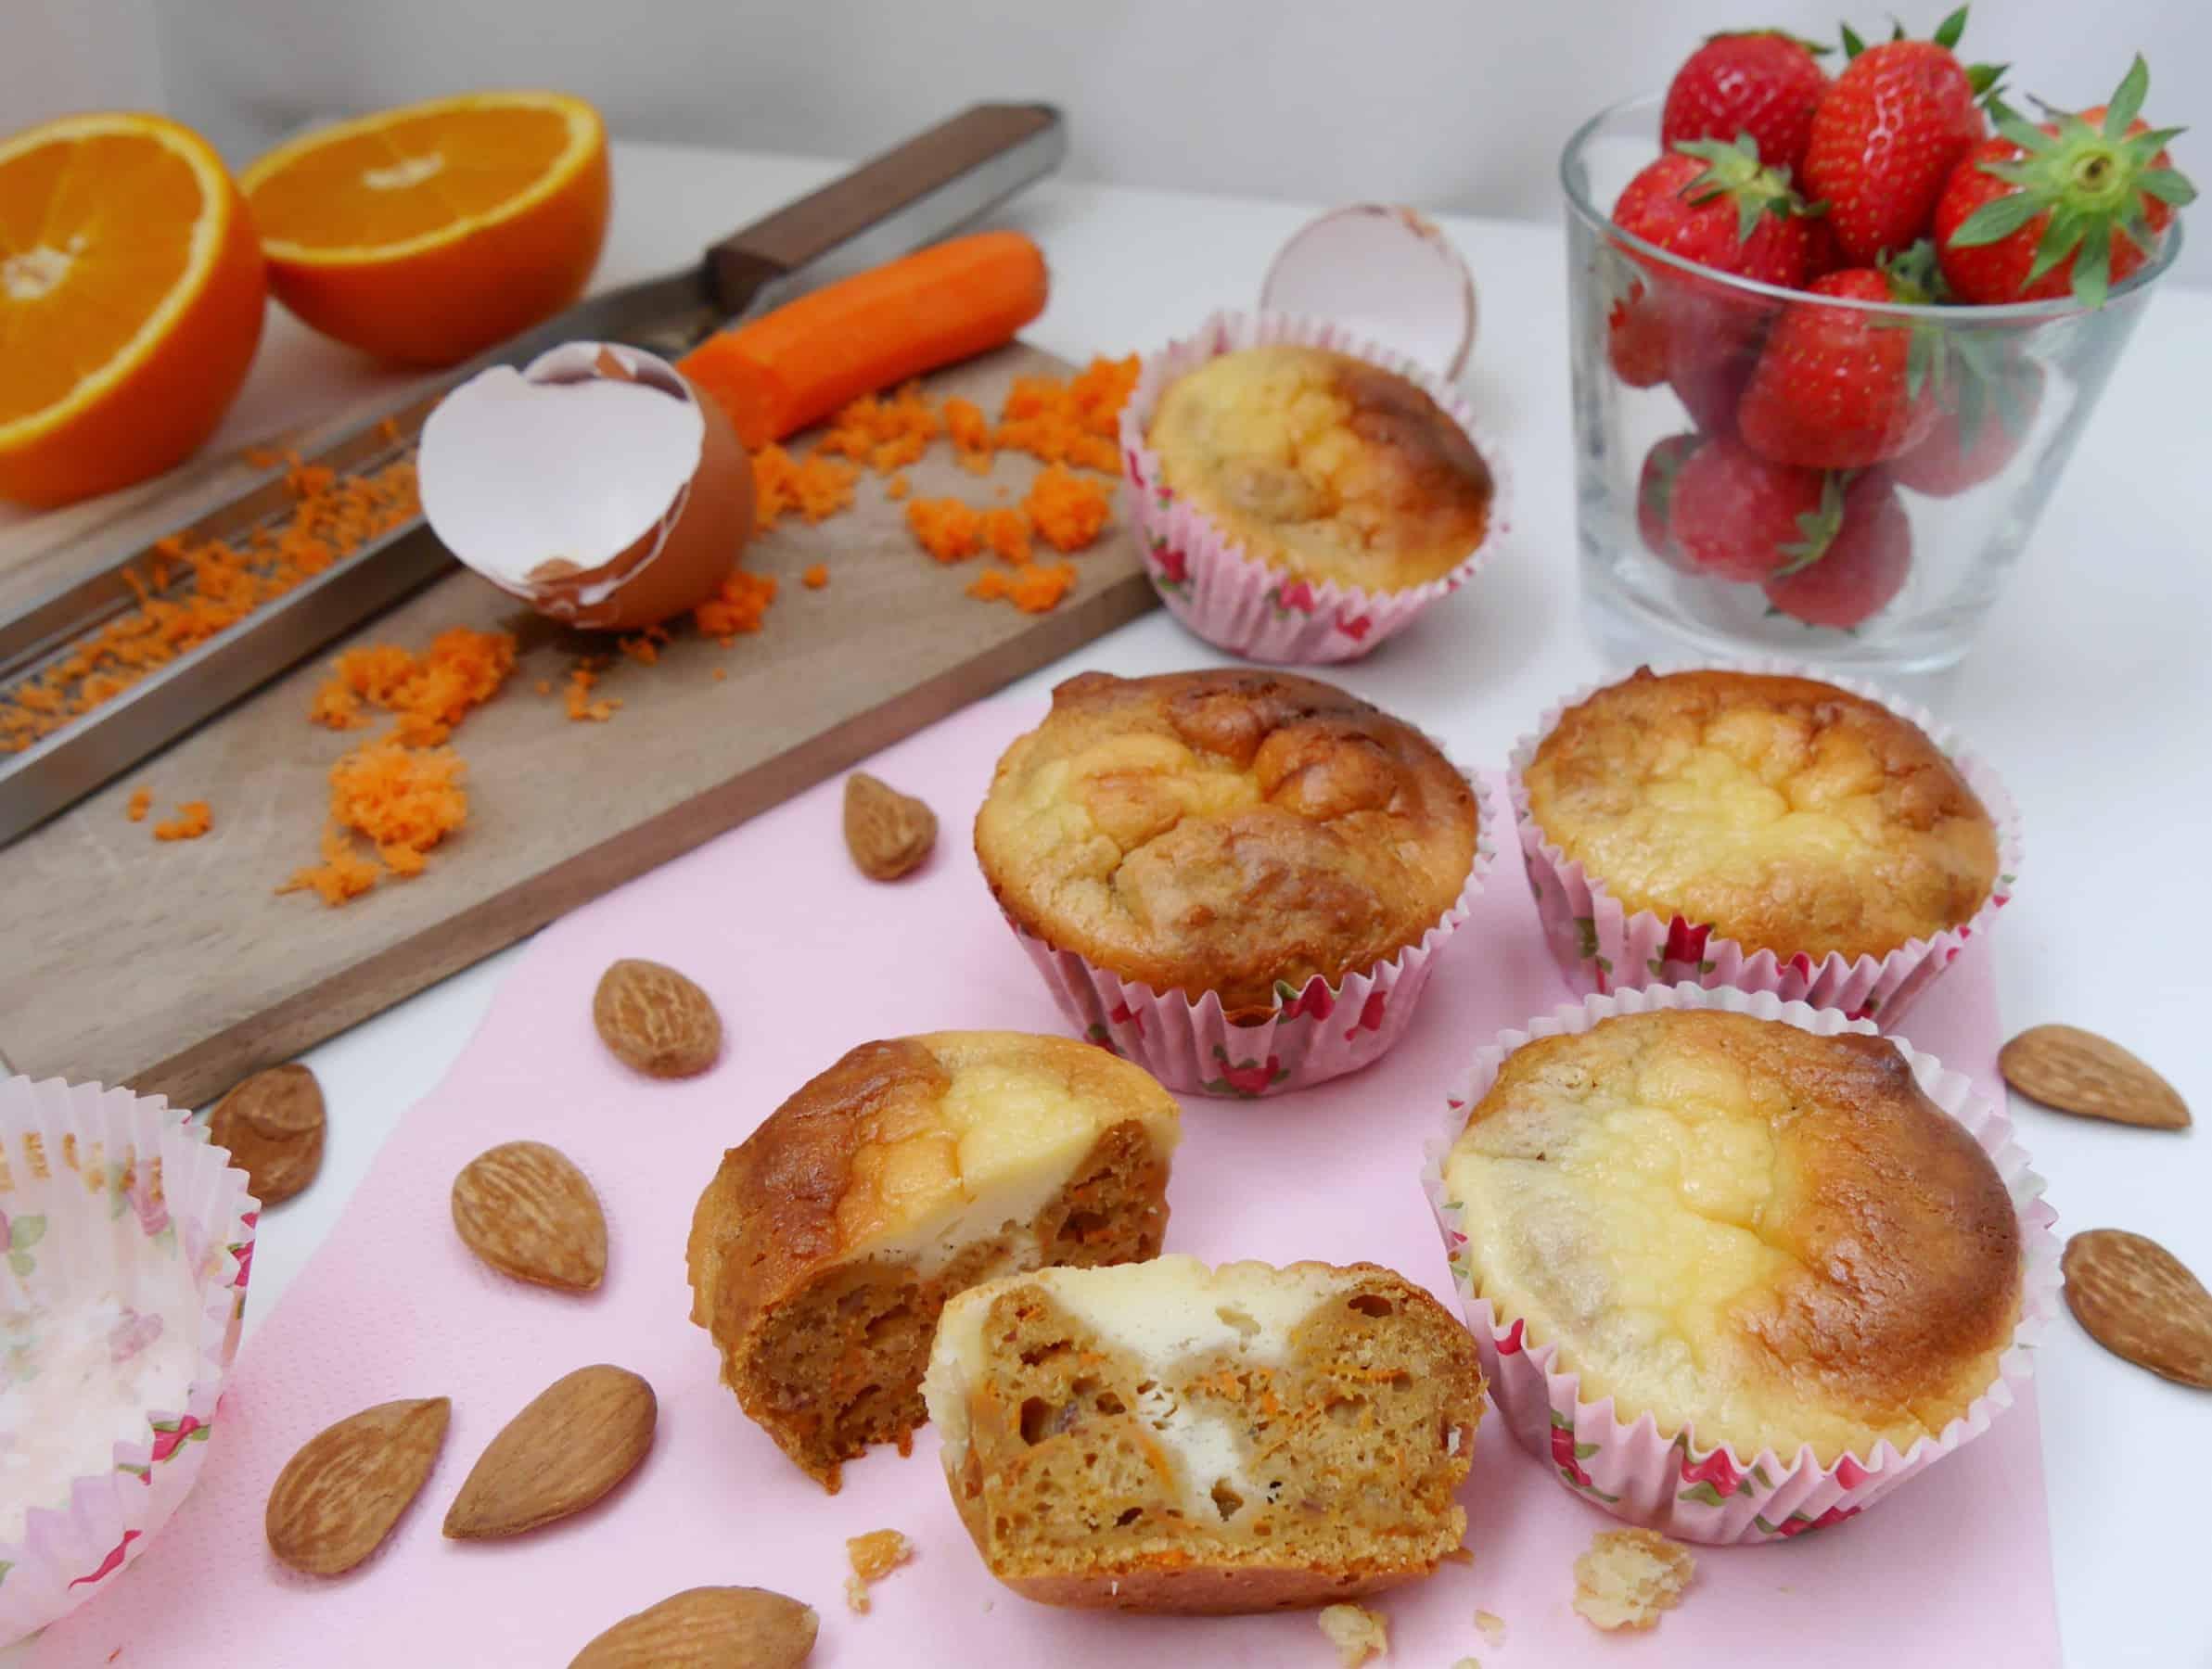 Karotten-Käsekuchen-Muffins by Dr. Alexa Iwan